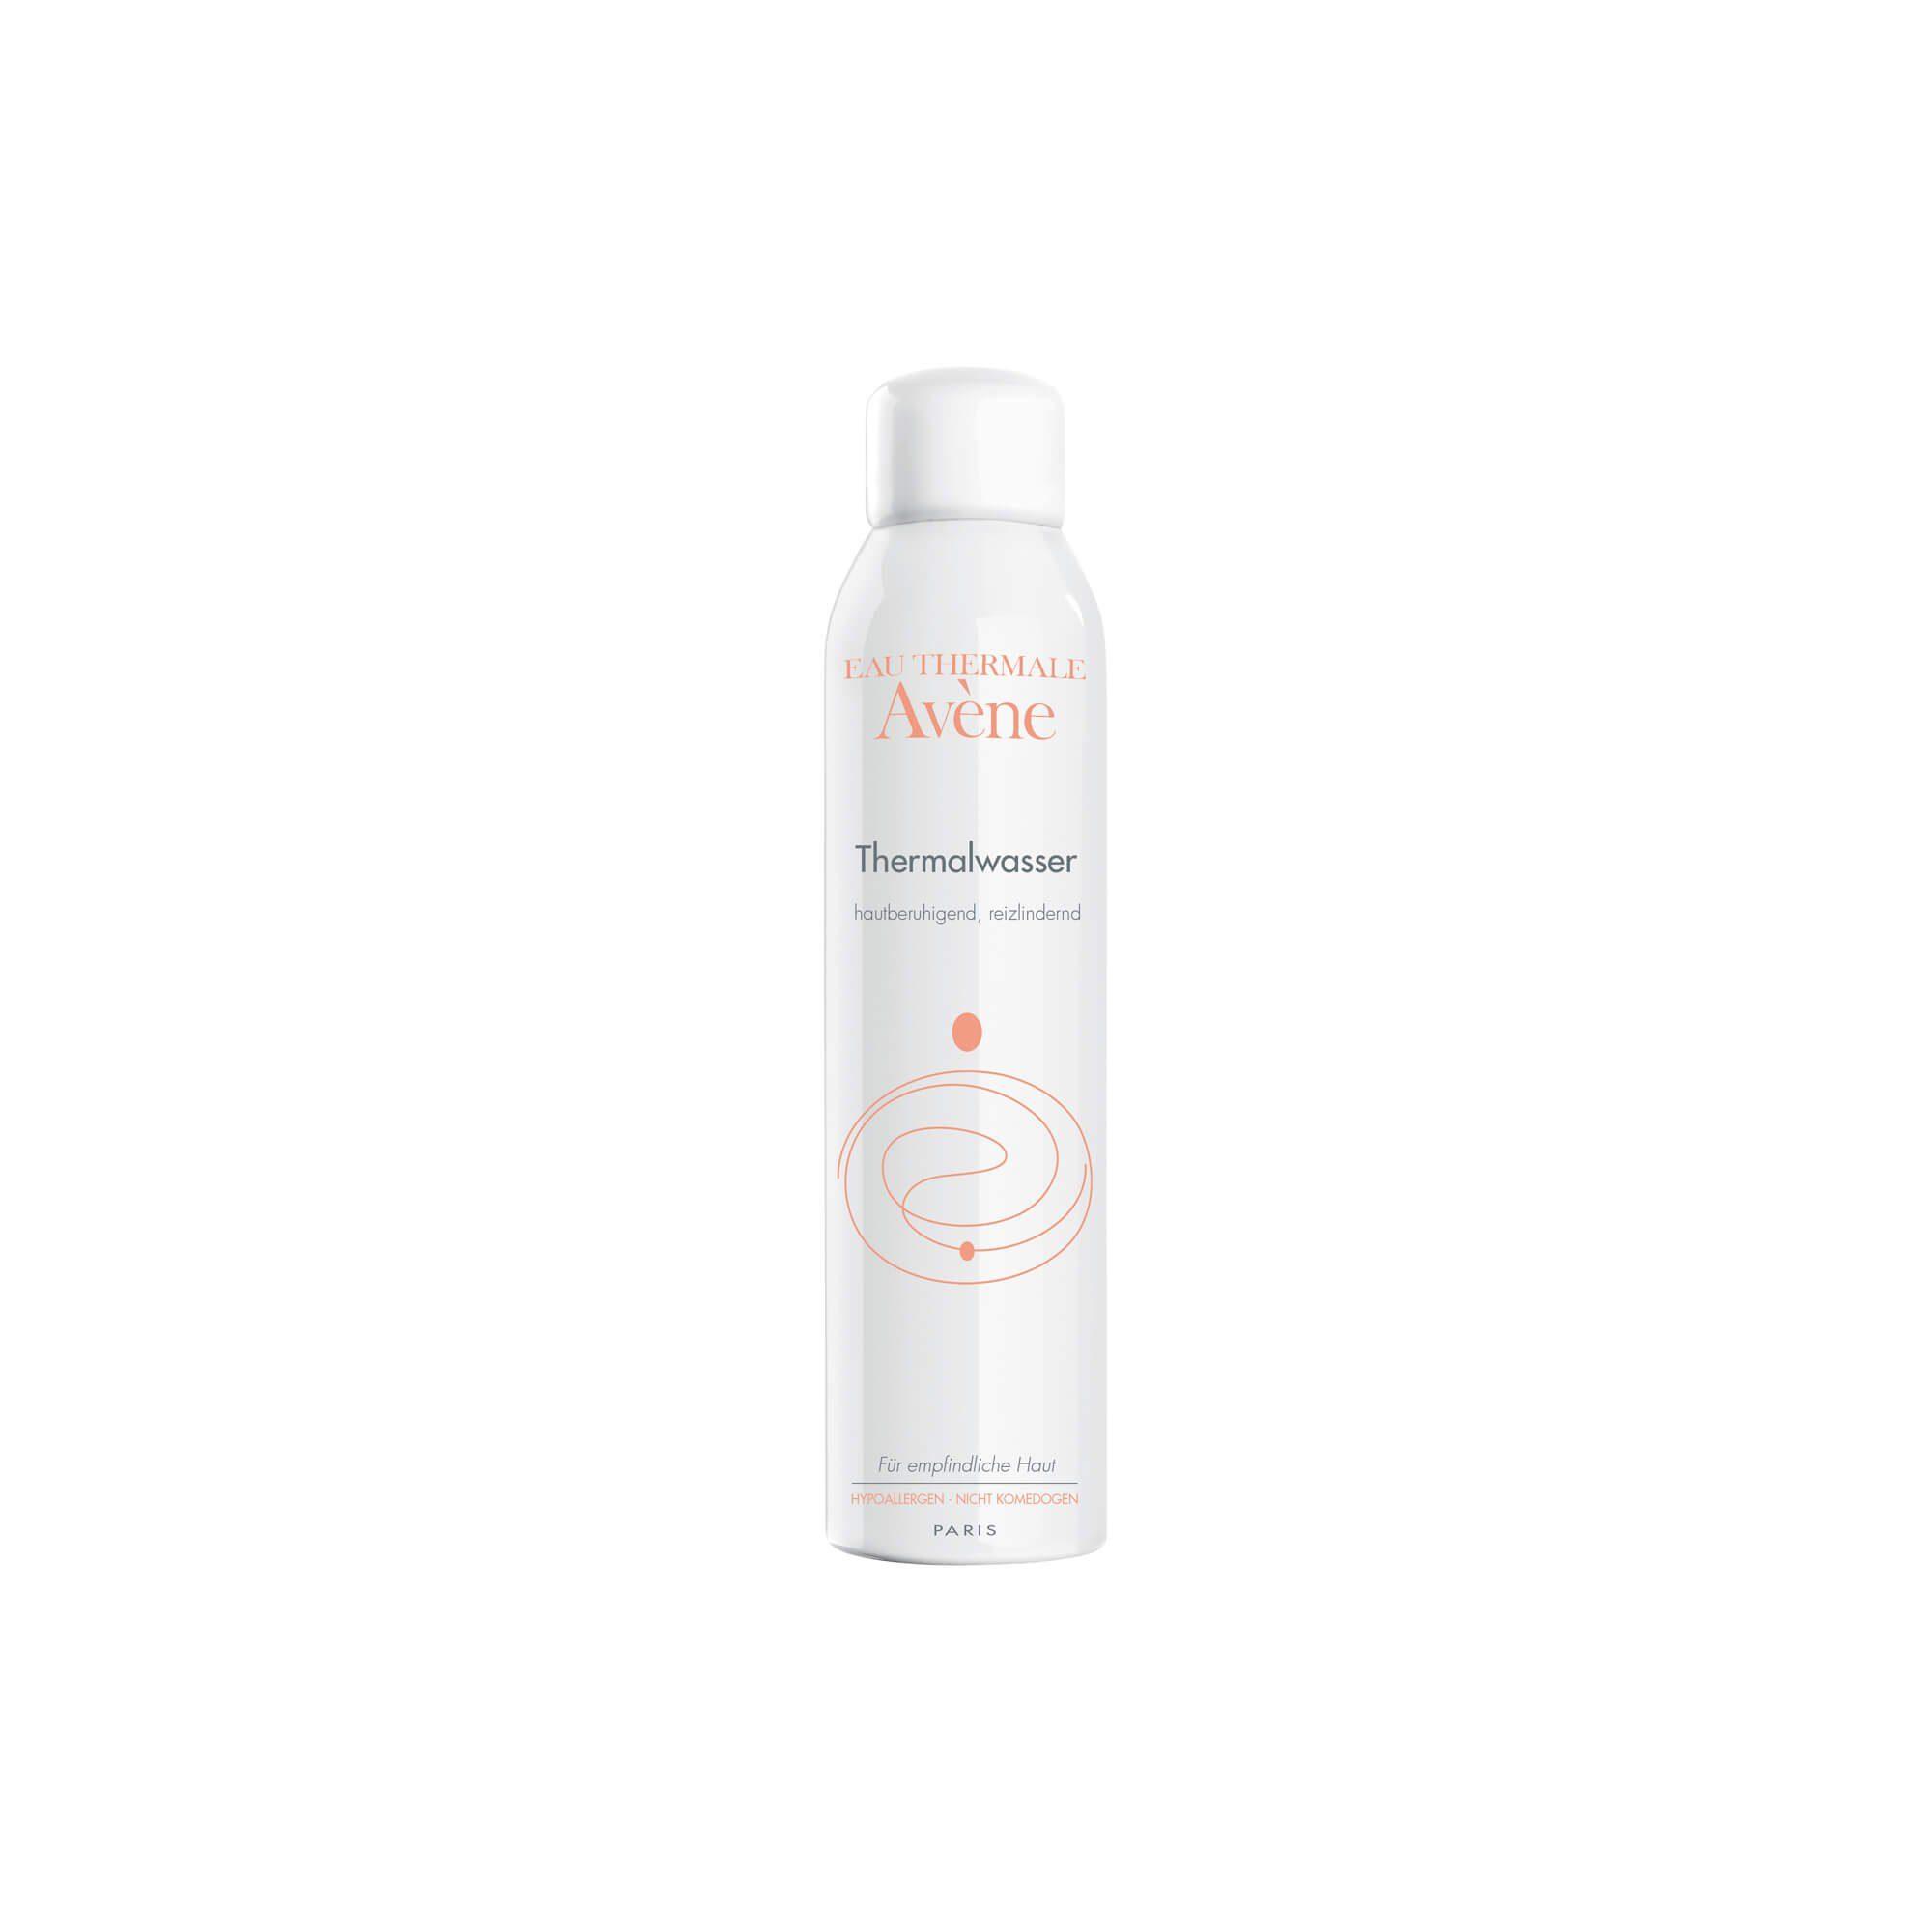 Avene Avene Thermalwasser Spray , 150 ml